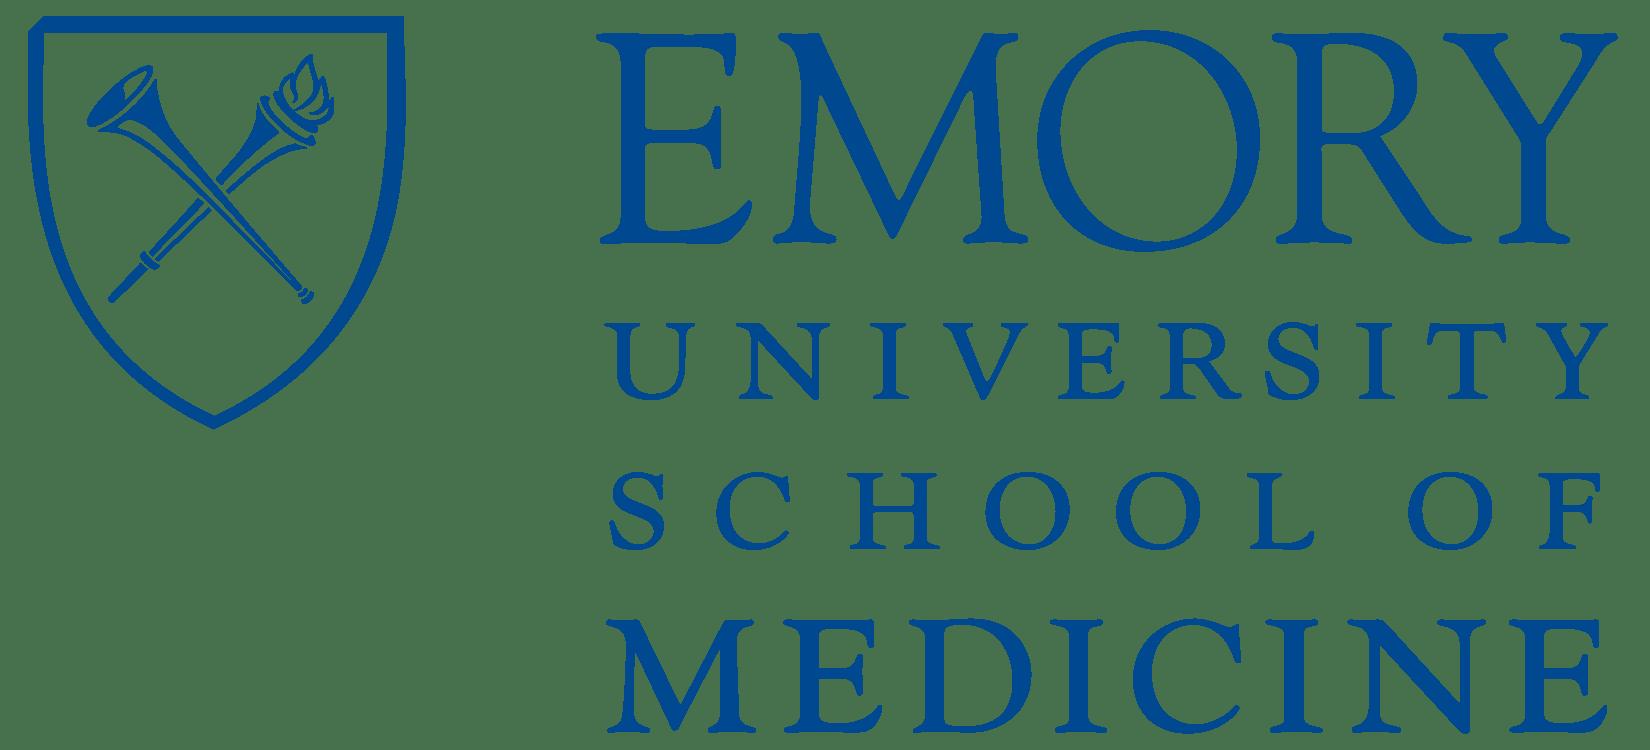 School of Medicine Logo